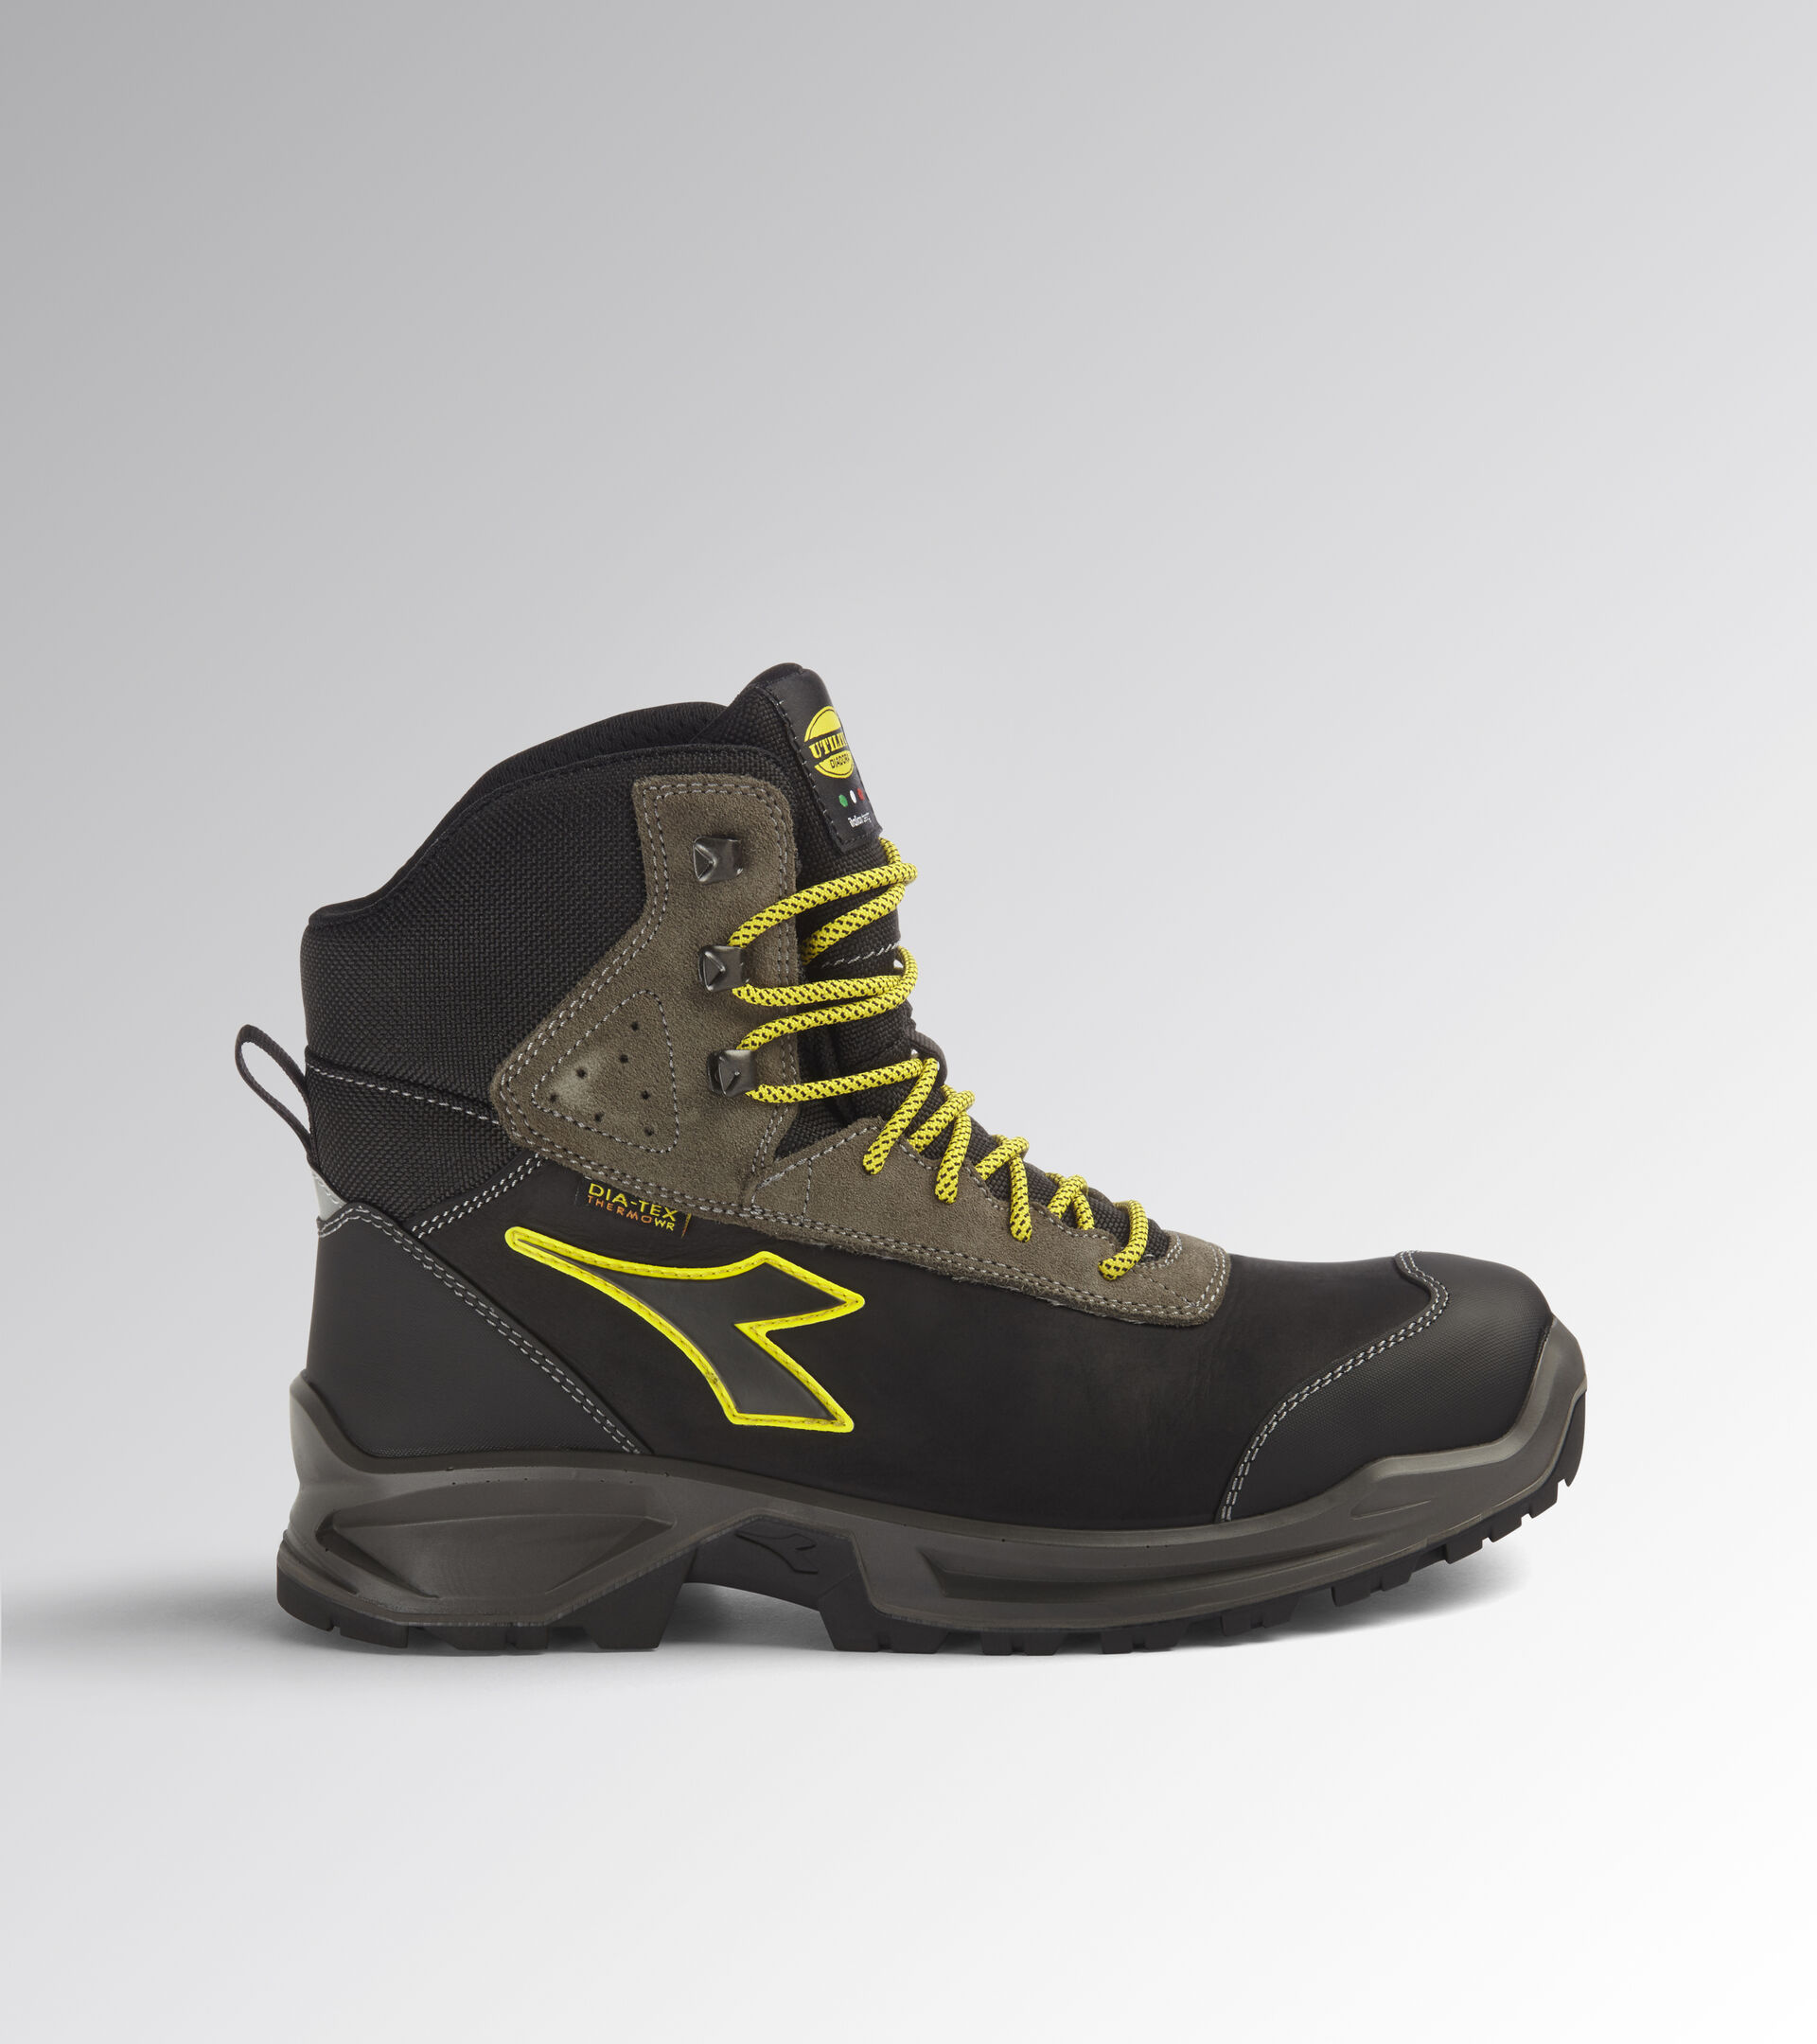 Footwear Utility UNISEX SPORT DIATEX HIGH S3 WR CI SRC BLACK/STEEL GRAY Utility